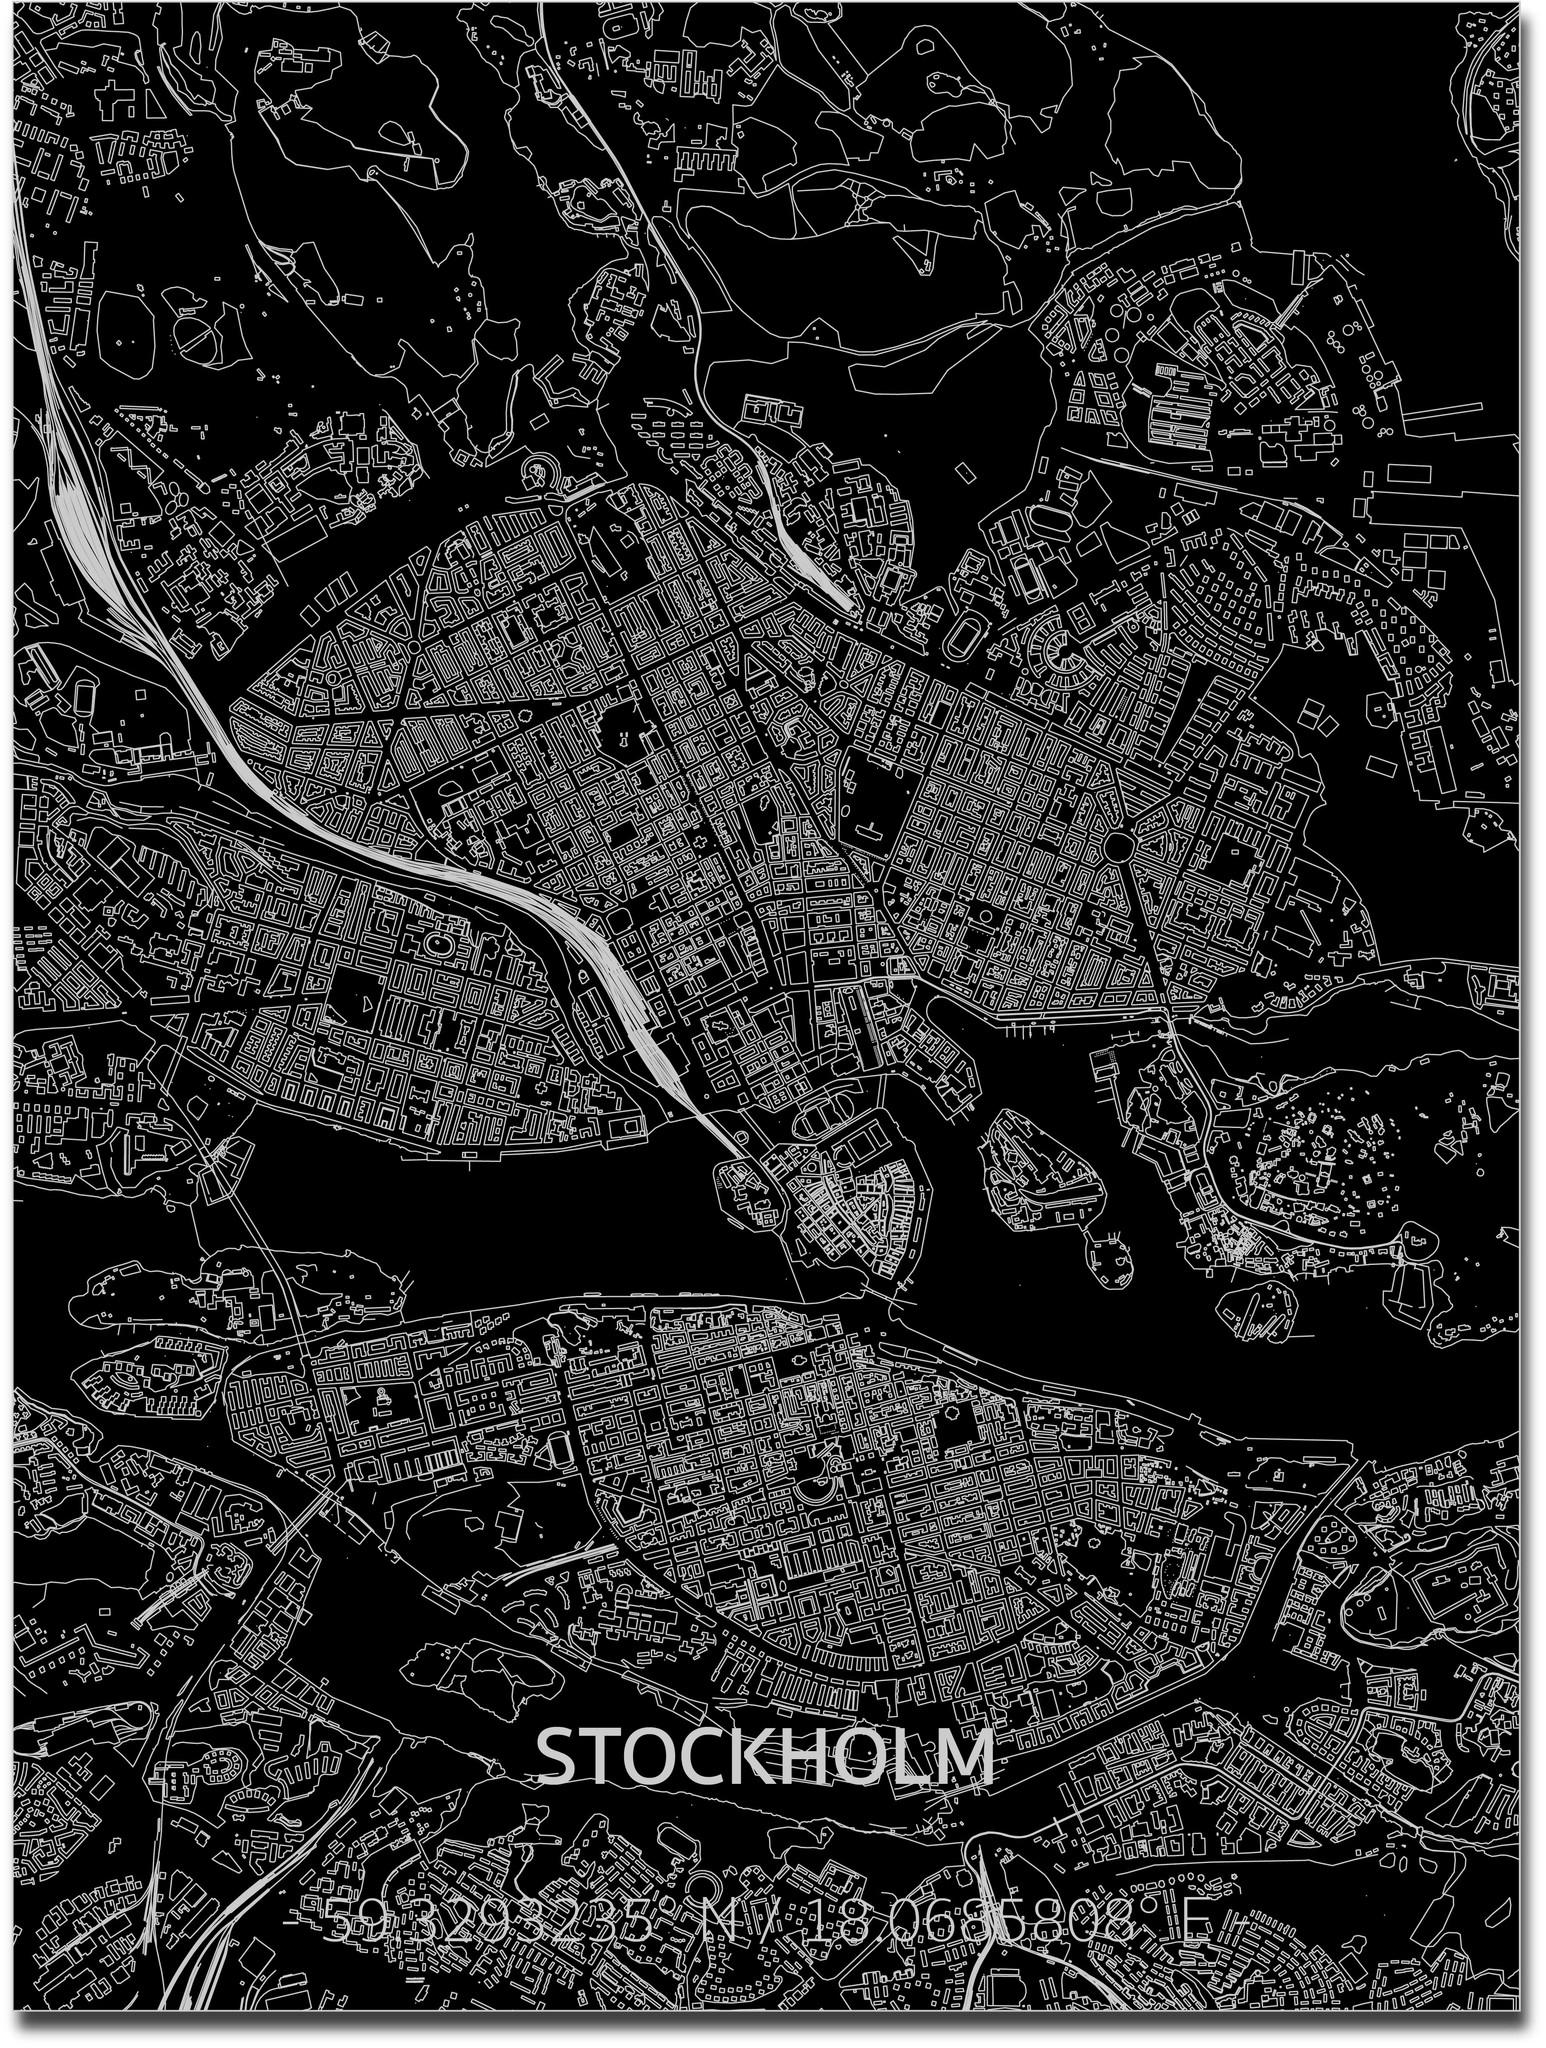 Stadtkarte Stockholm | Aluminium Wanddekoration-1